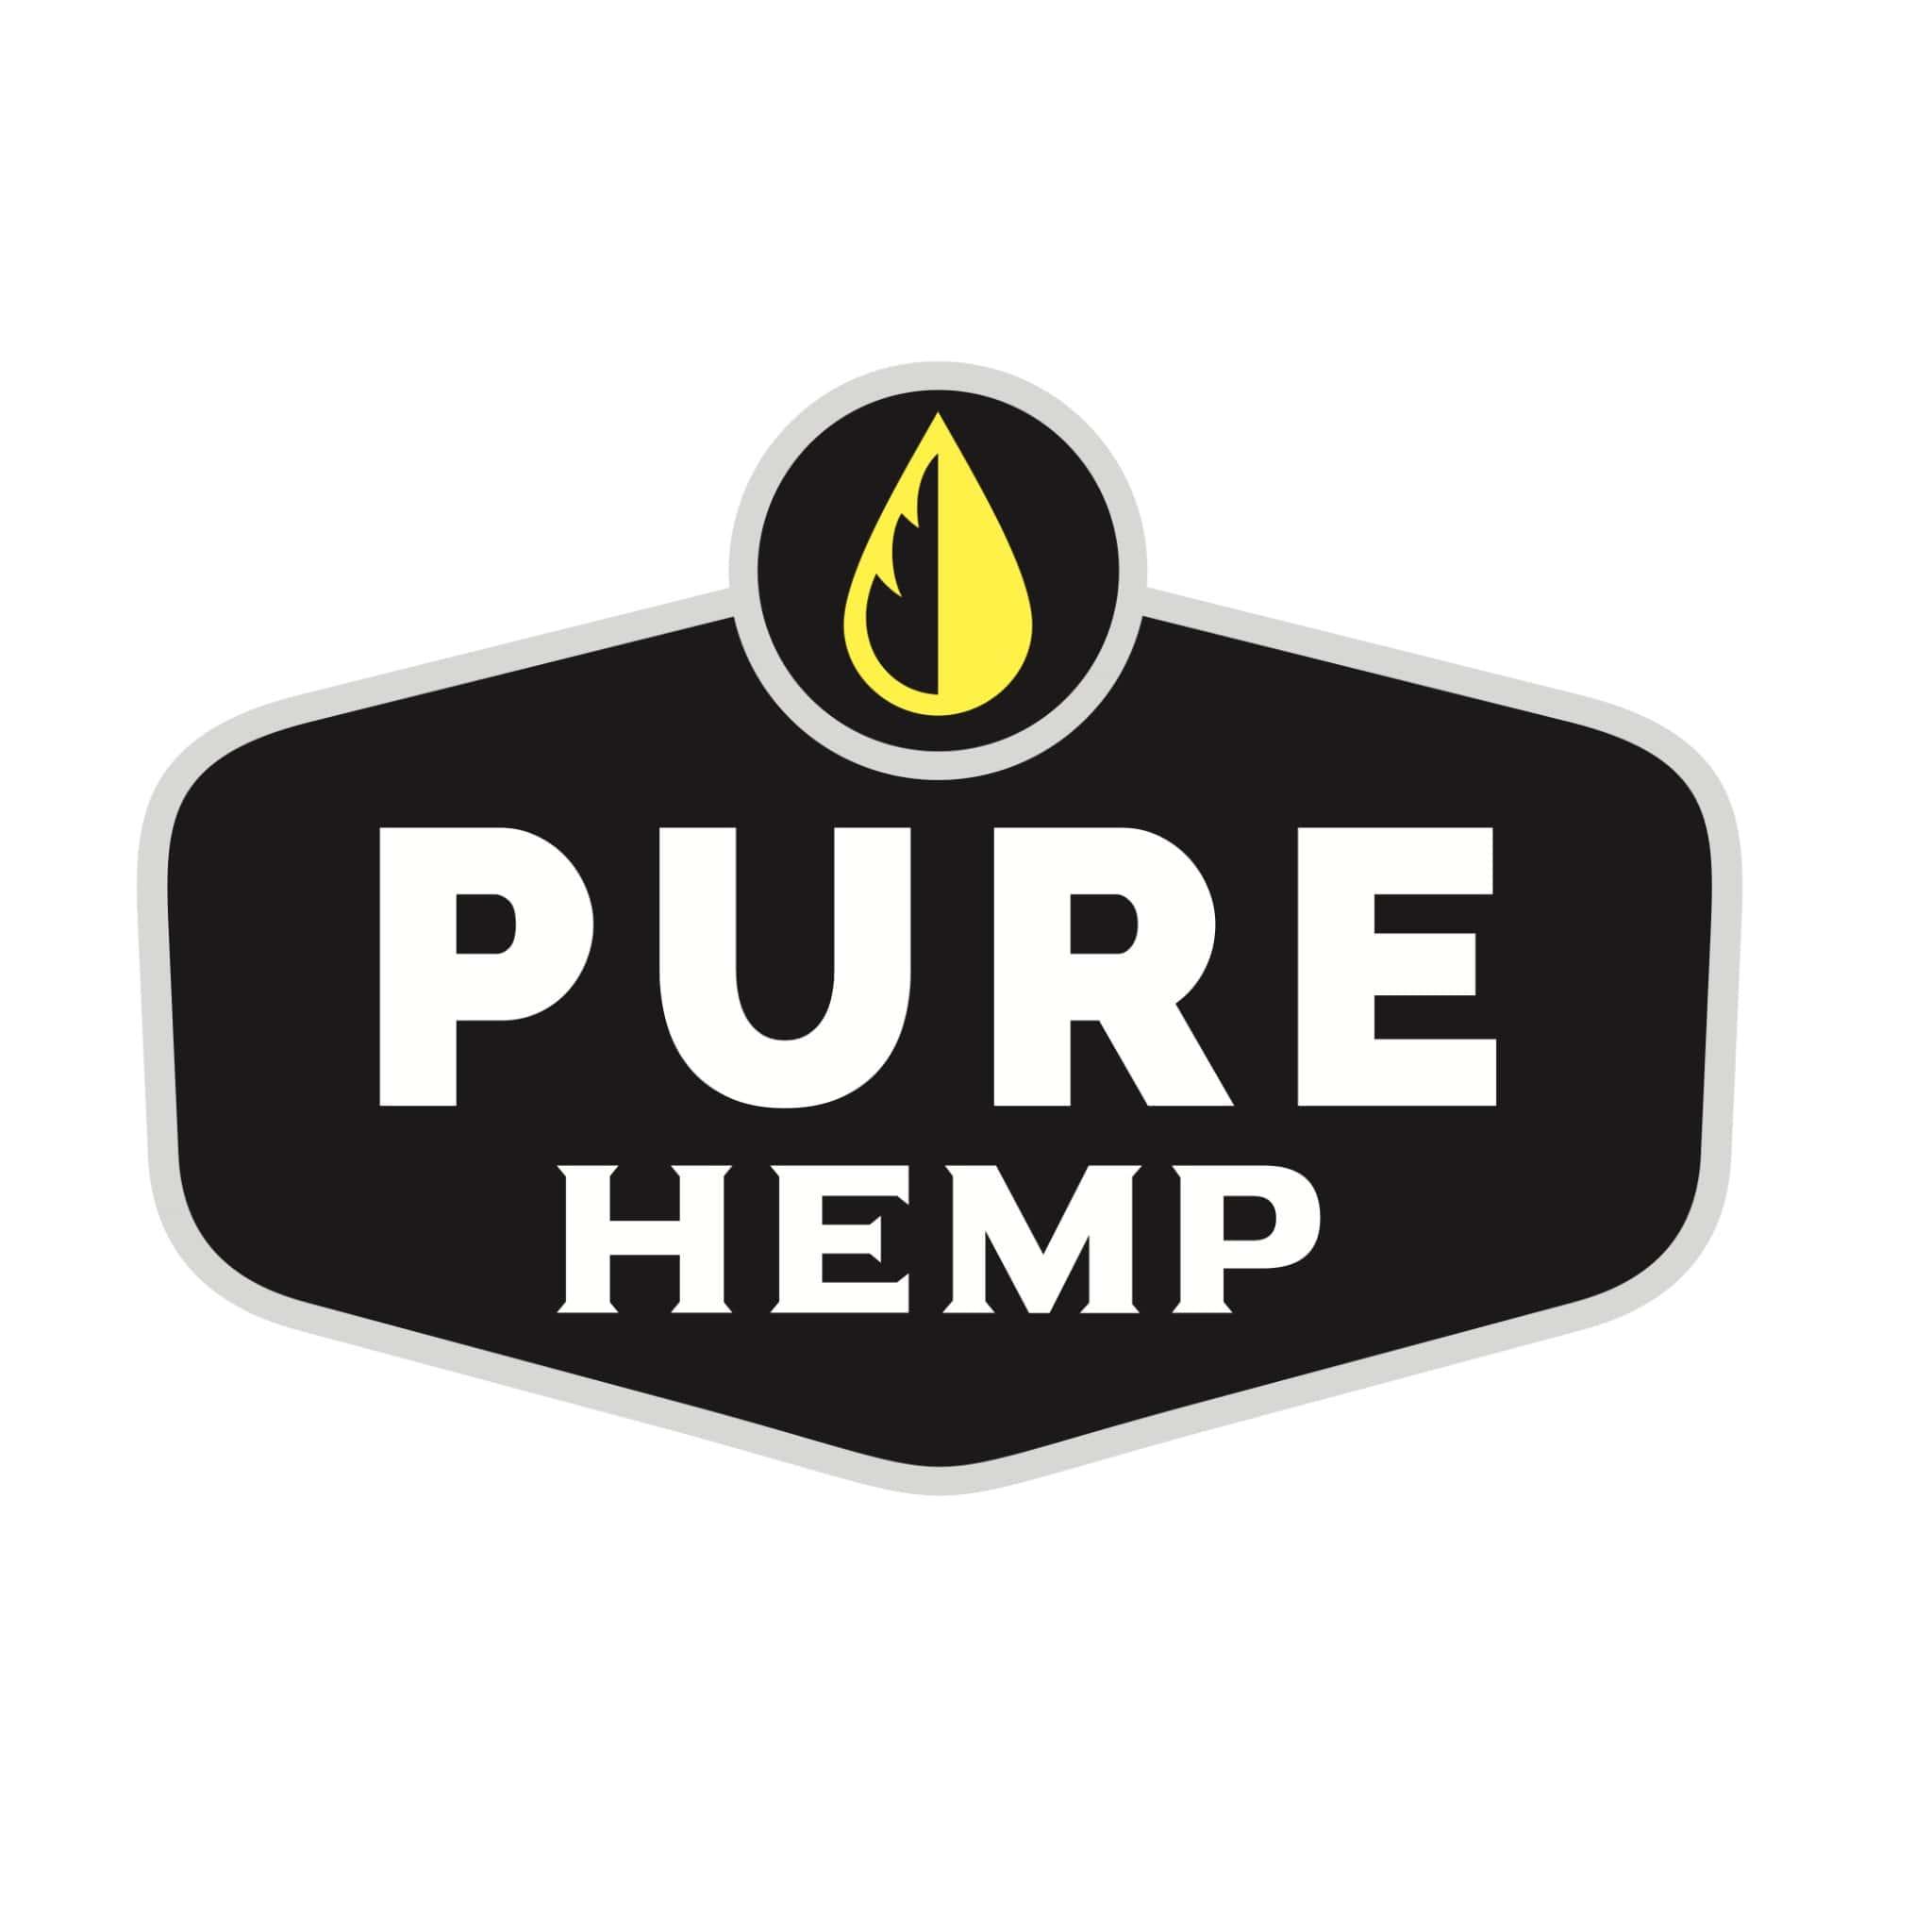 Pure Hemp logo